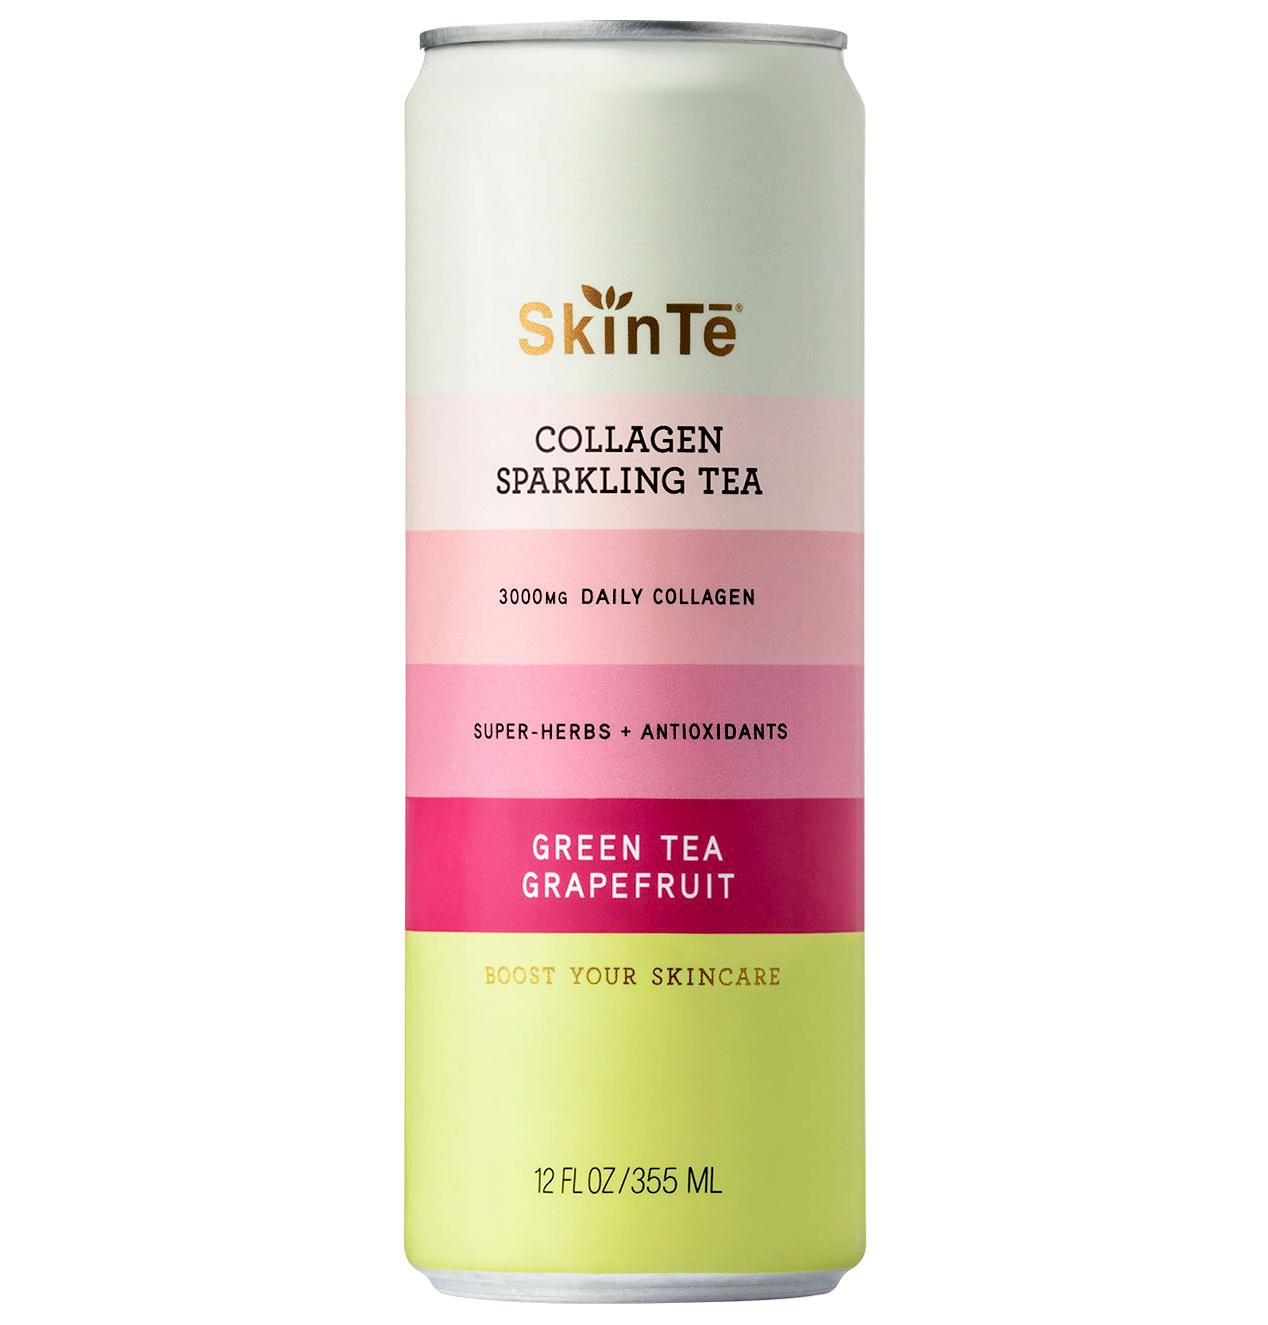 skinte collagen sparkling green tea grapefruit